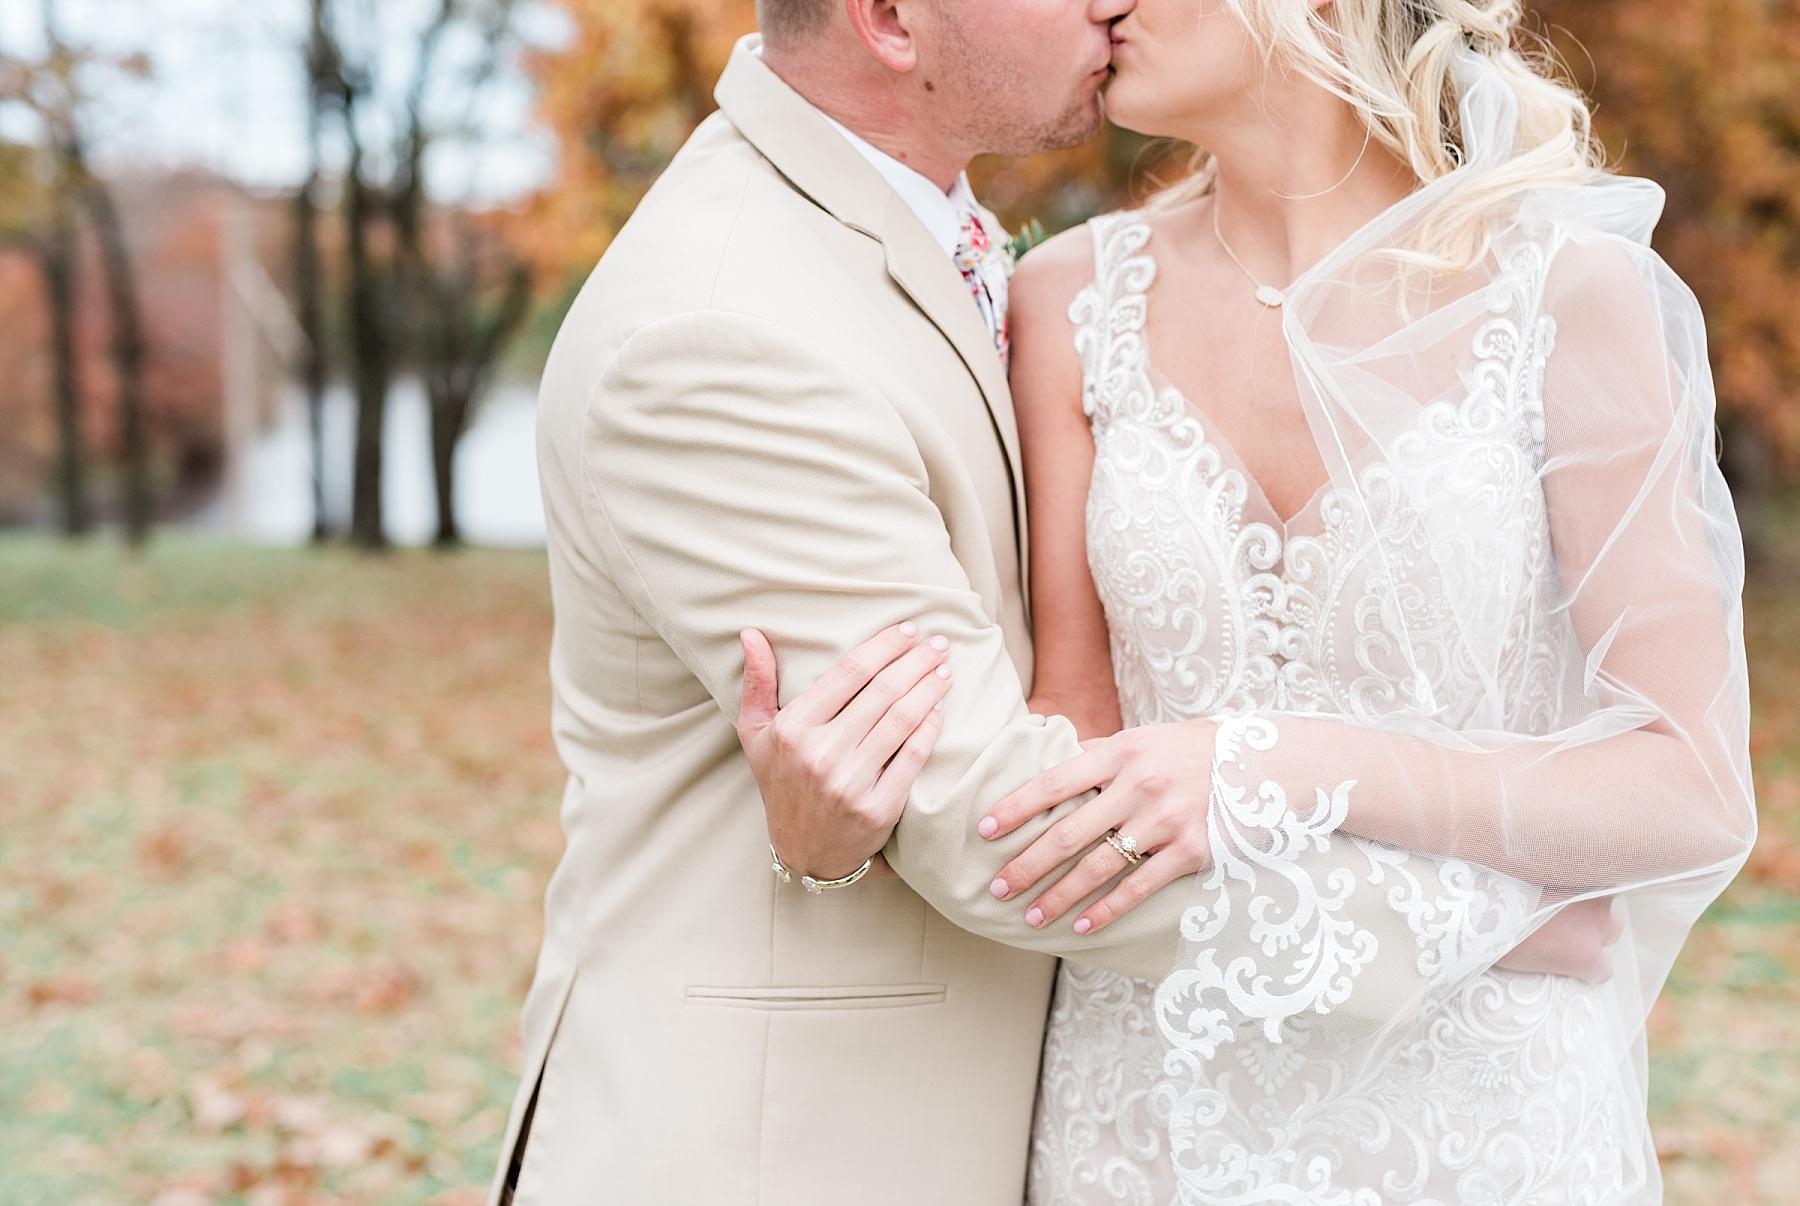 Lakeside Wedding in Fall at Mighty Oak Lodge by Misouri Wedding Photographer Kelsi Kliethermes Photography_0003.jpg